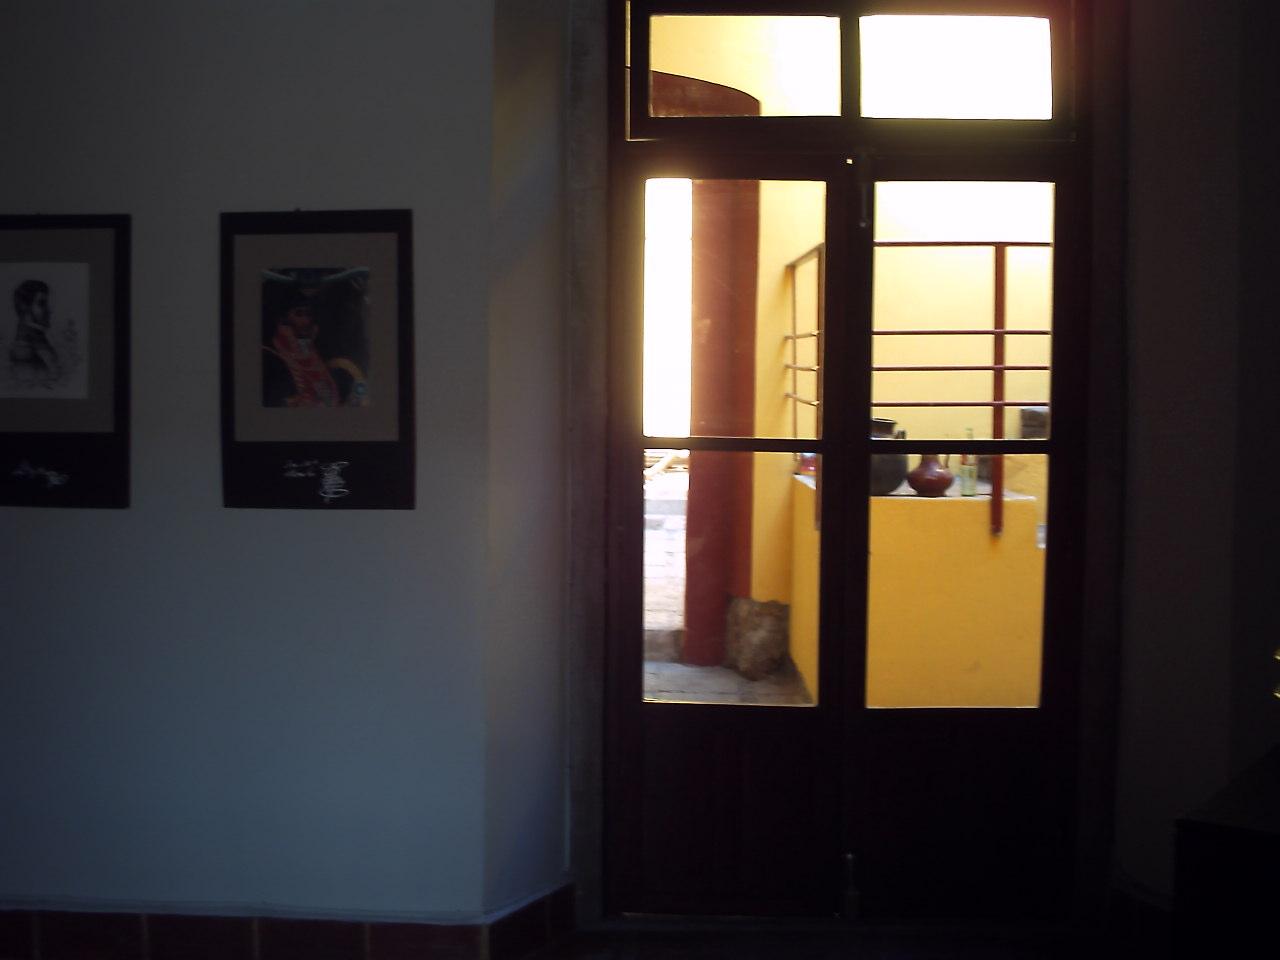 cultura san luis potosi mexico Eqiiz exposiciones centro de cultura mariano jimenez fotografia